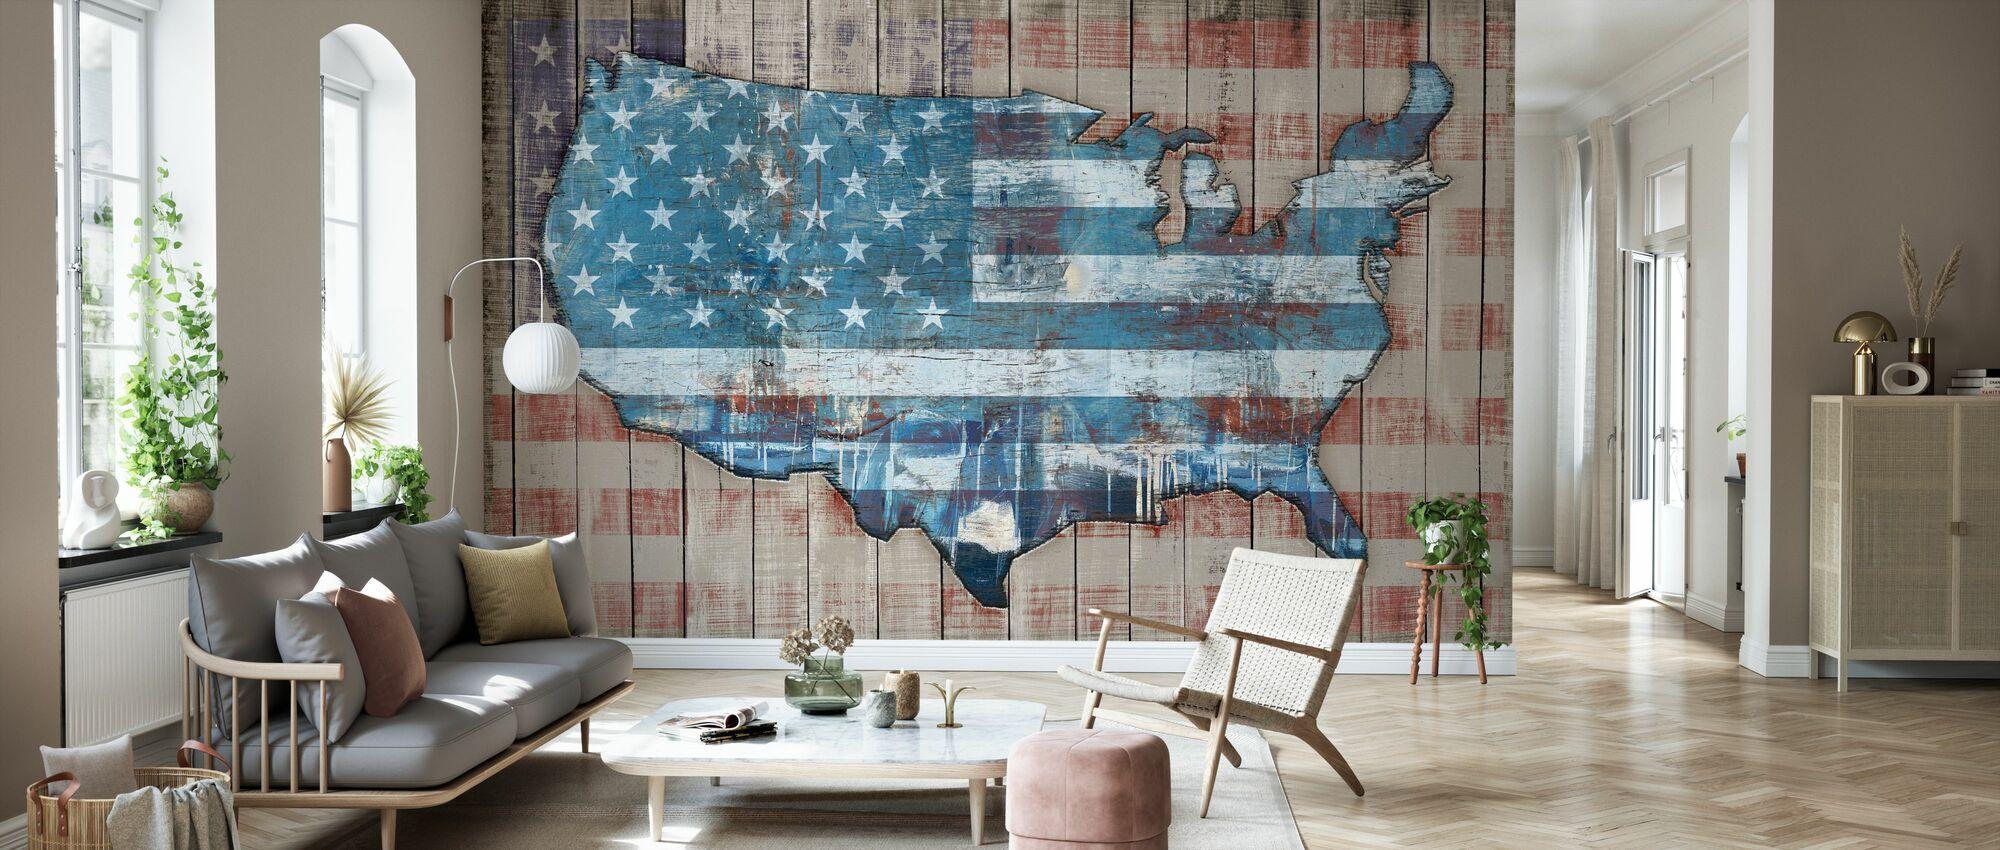 USA Map - Sky - Wallpaper - Living Room